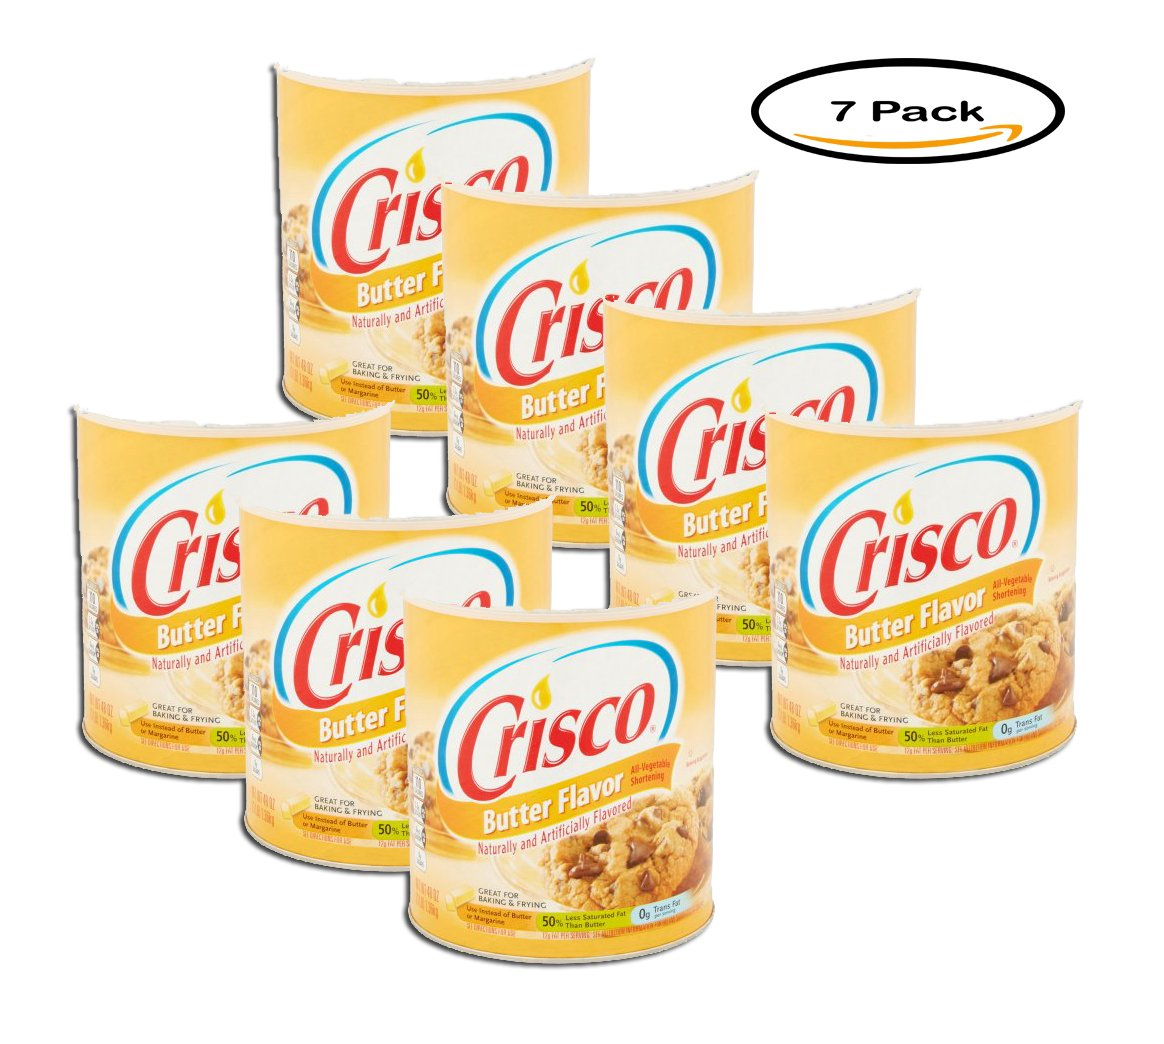 PACK OF 7 - Crisco Butter Flavor All-Vegetable Shortening, 48 oz